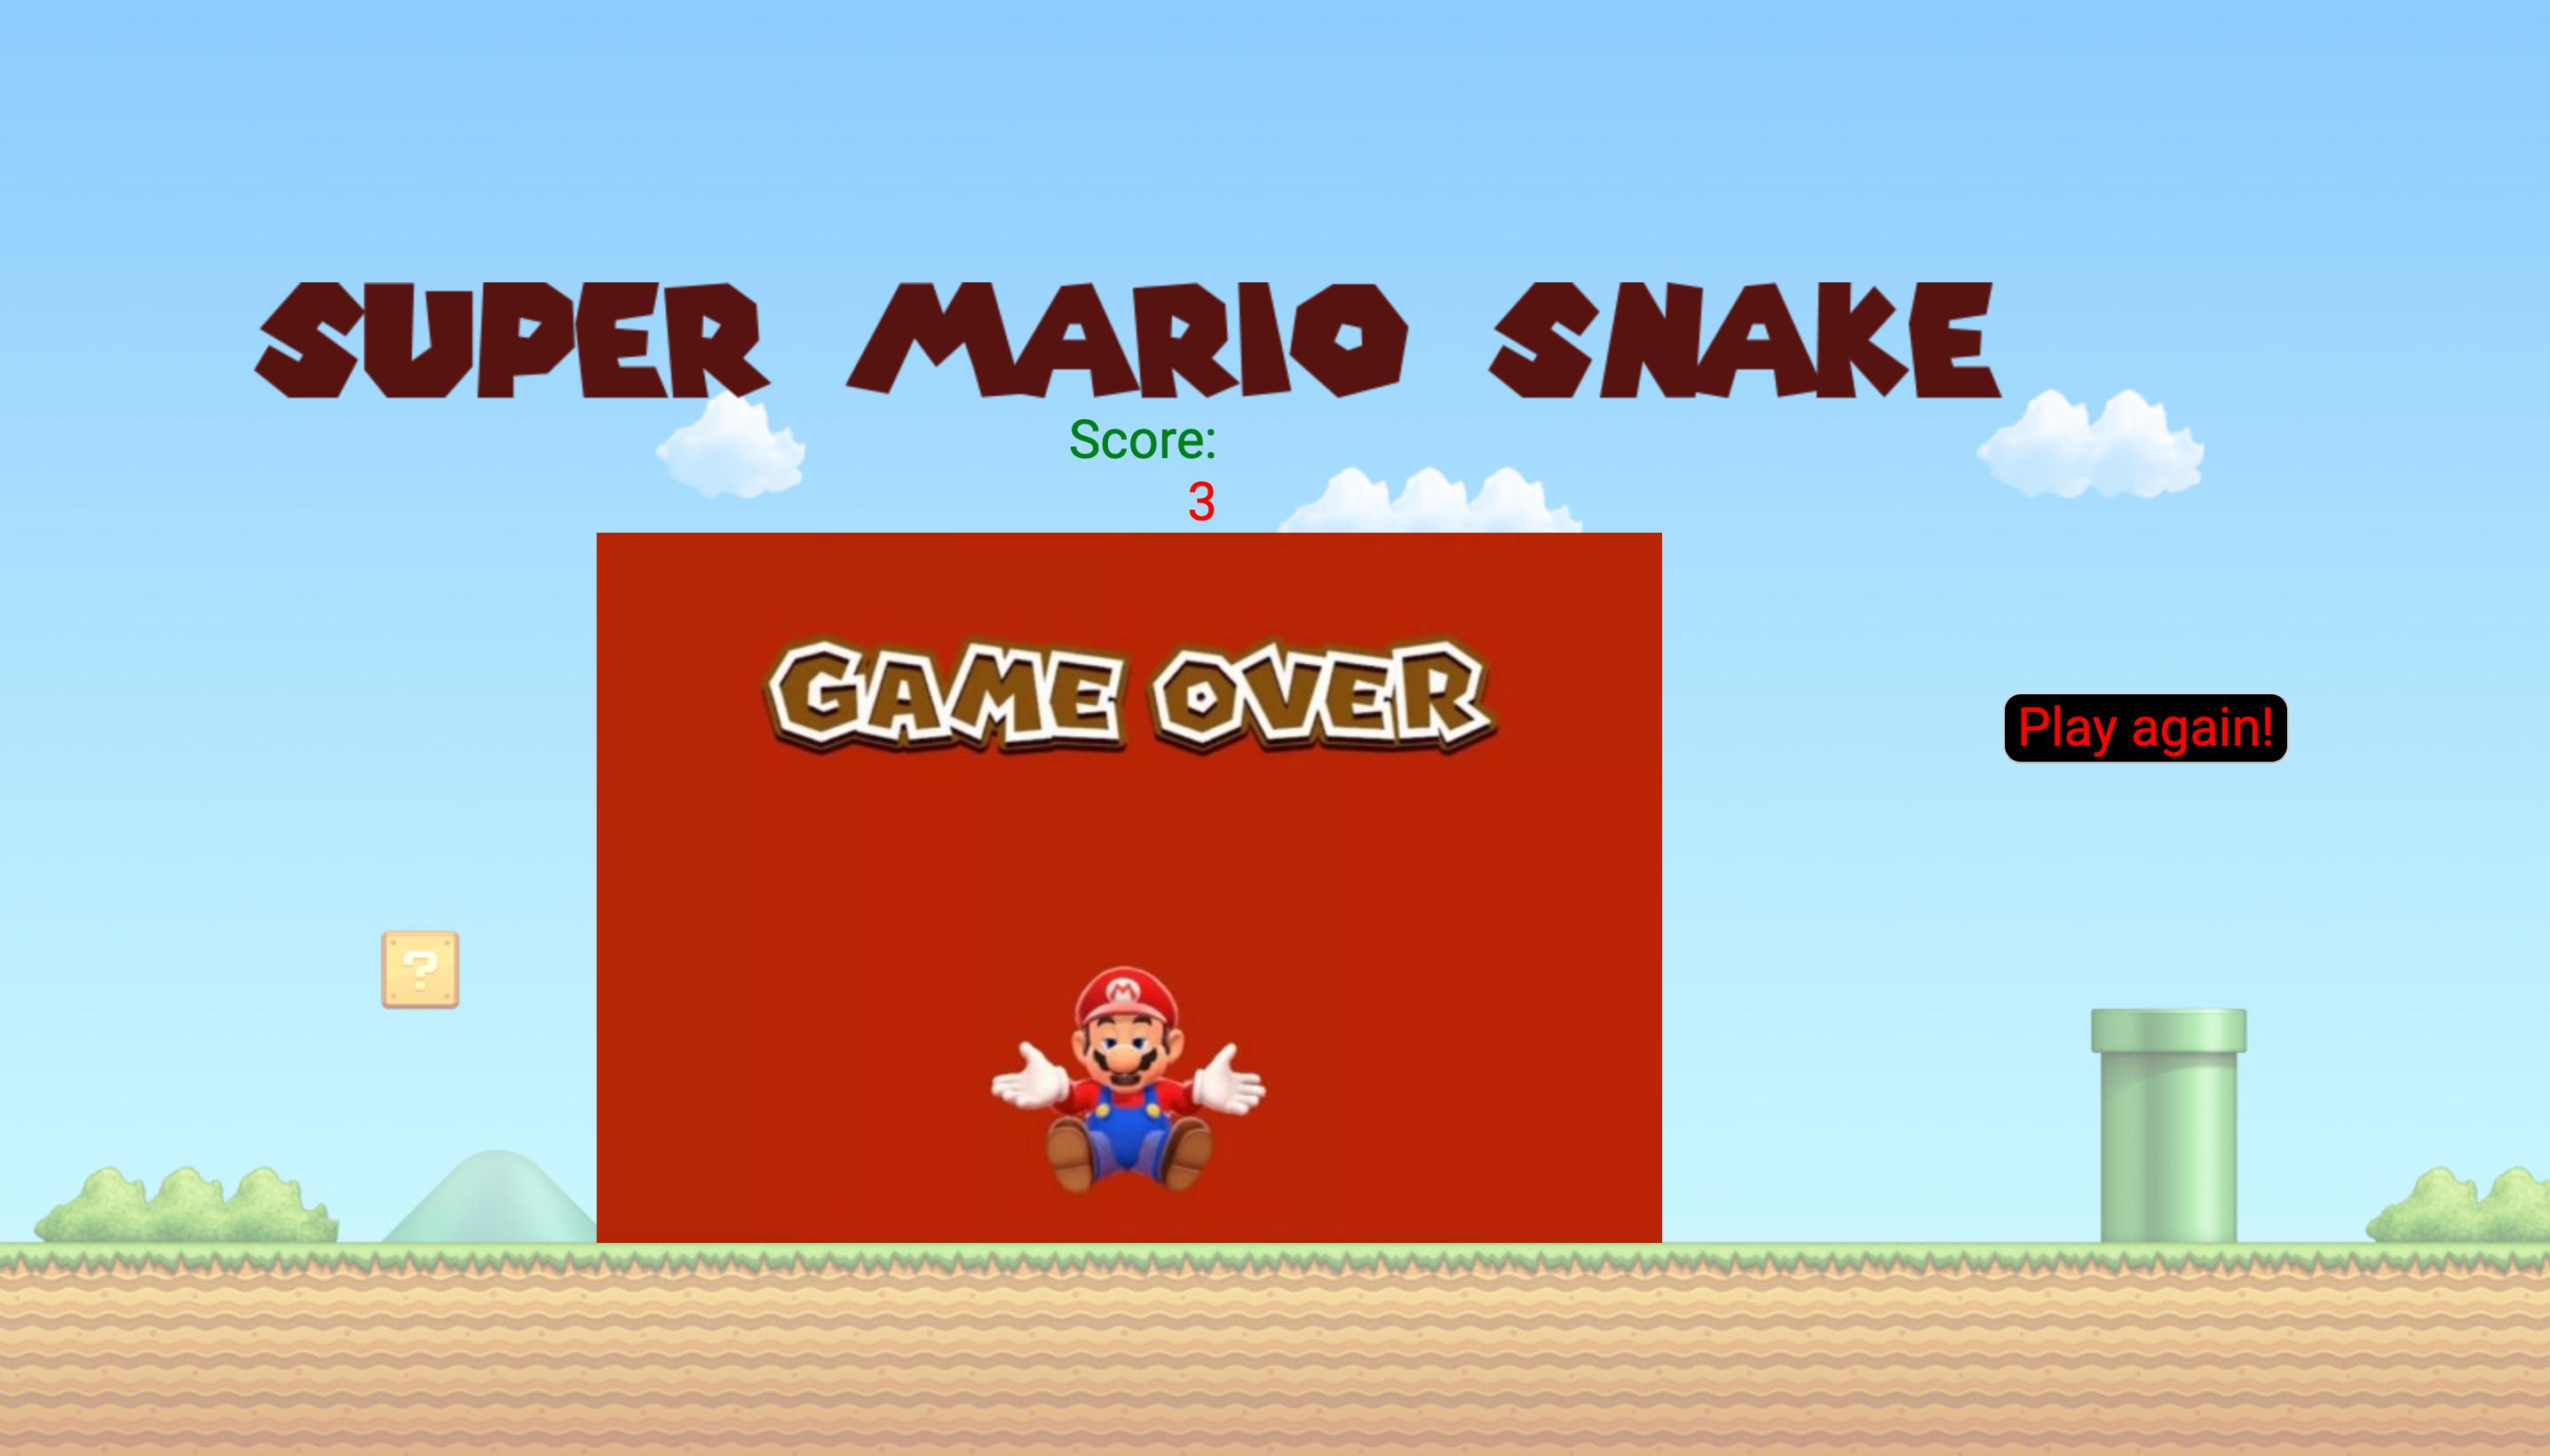 GitHub - arj8728/SEI-Project-01-Snake-Game: Vanilla